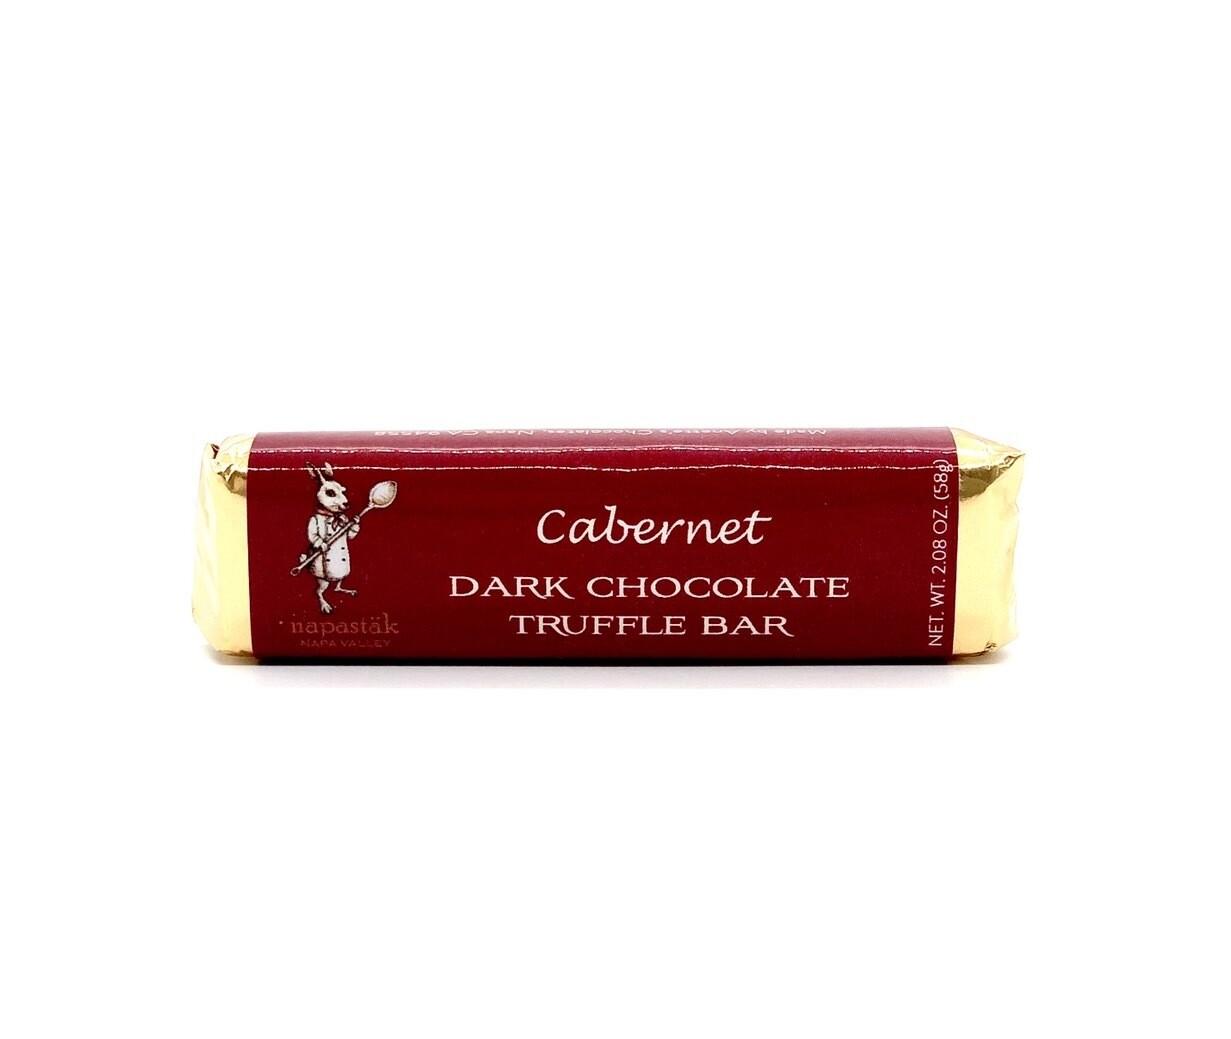 Cabernet Truffle Dark Chocolate Bar